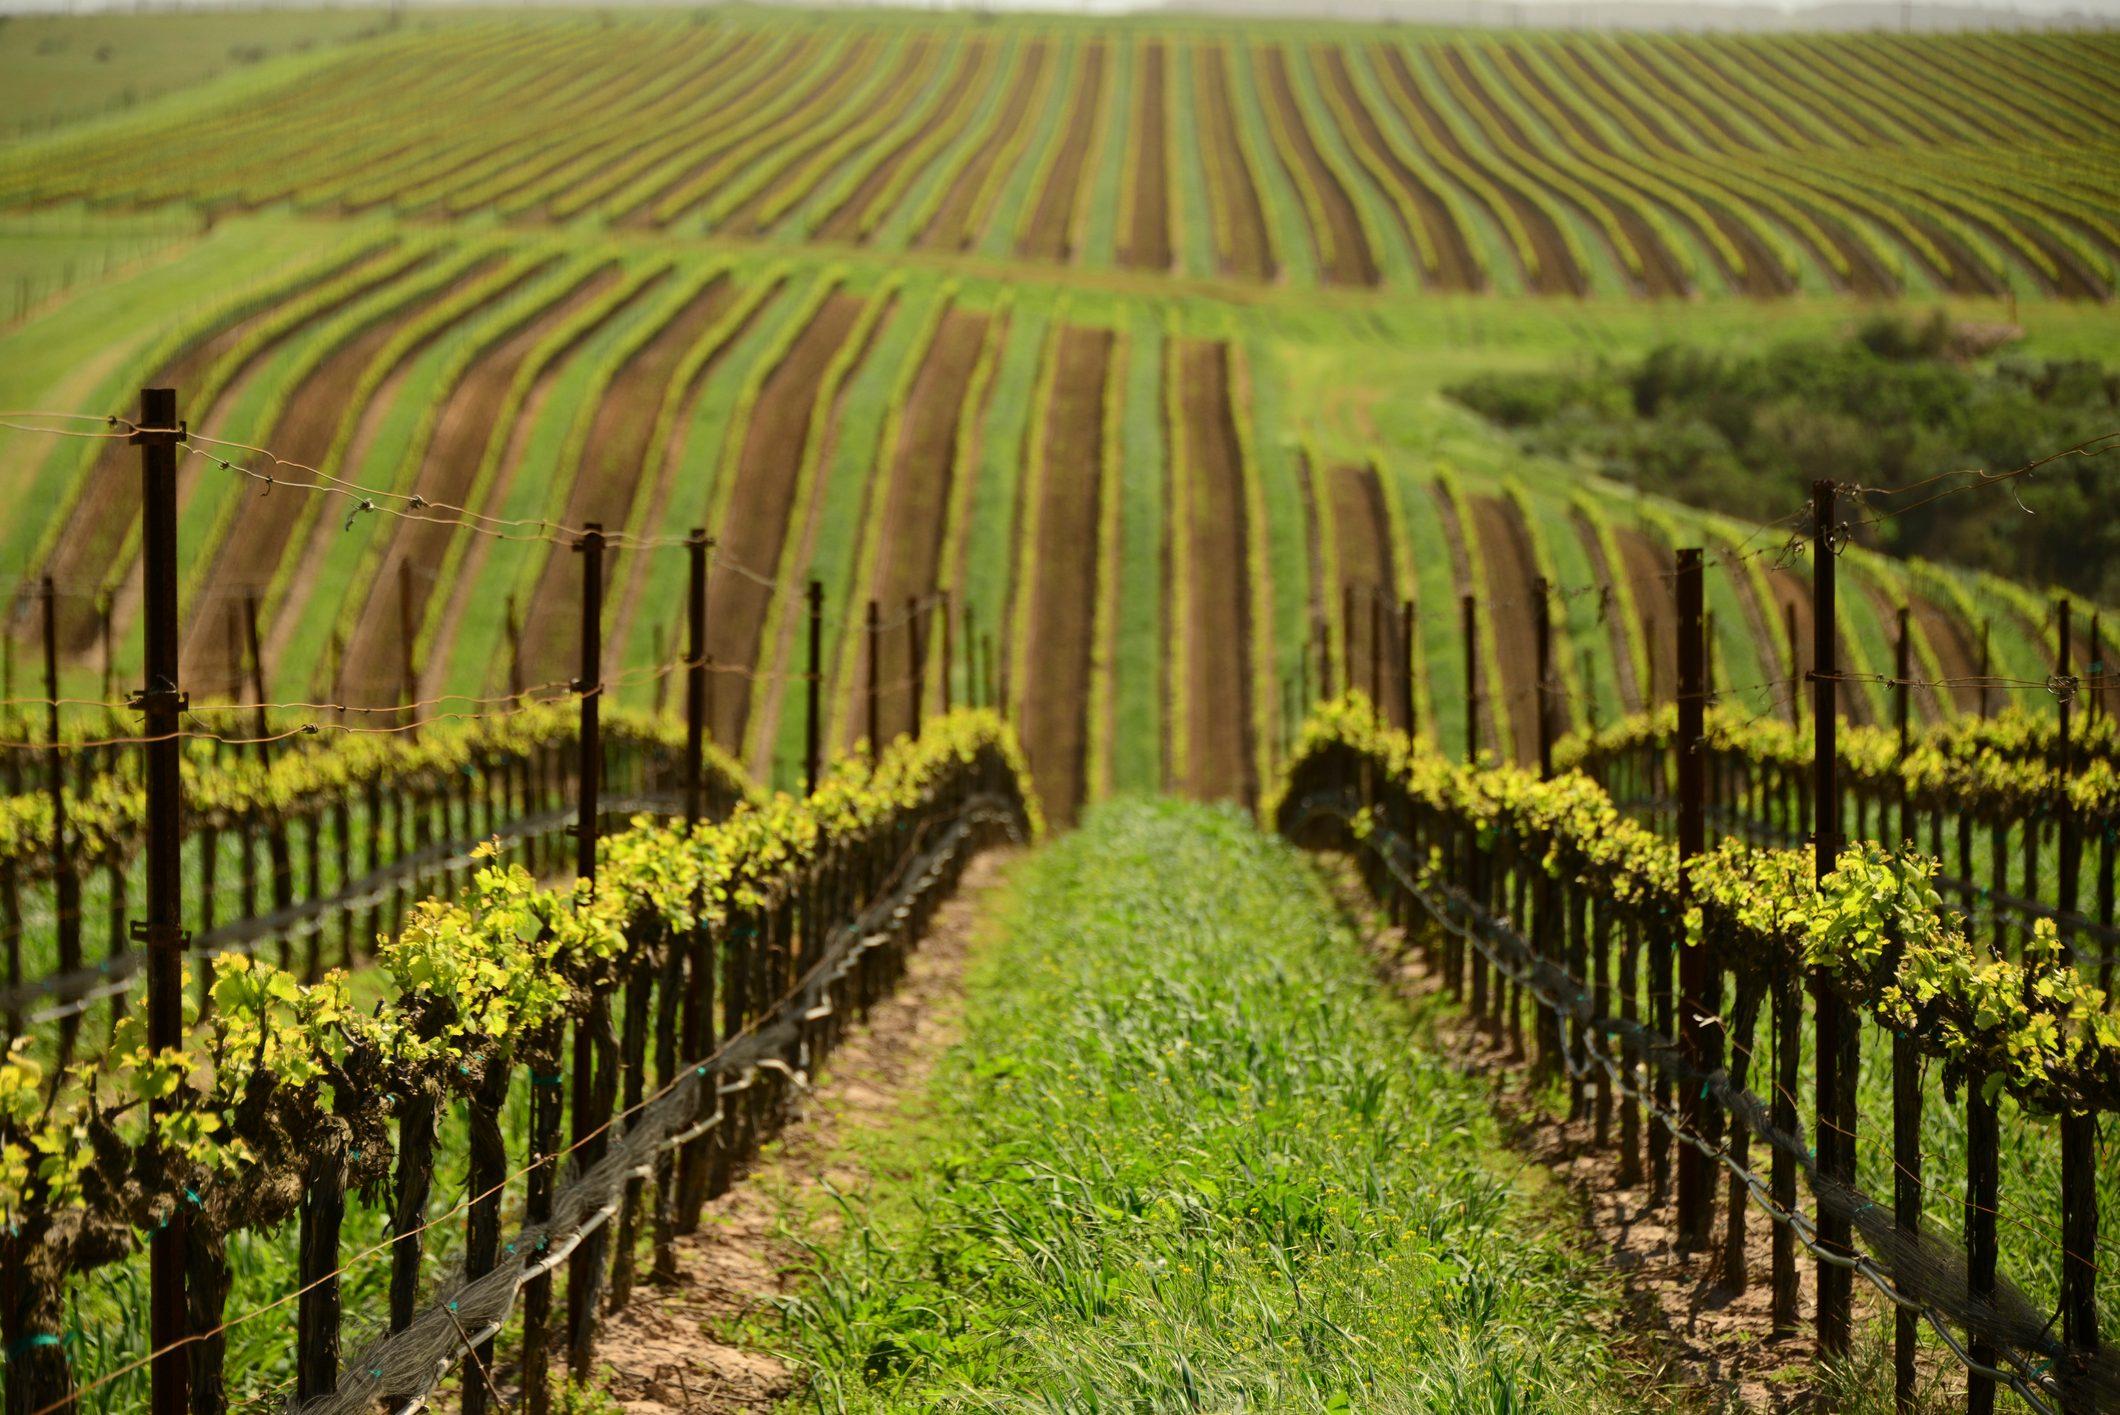 geometric pattern of spring time vines in vineyard at winery near Santa Maria in Santa Barbara County, California, USA